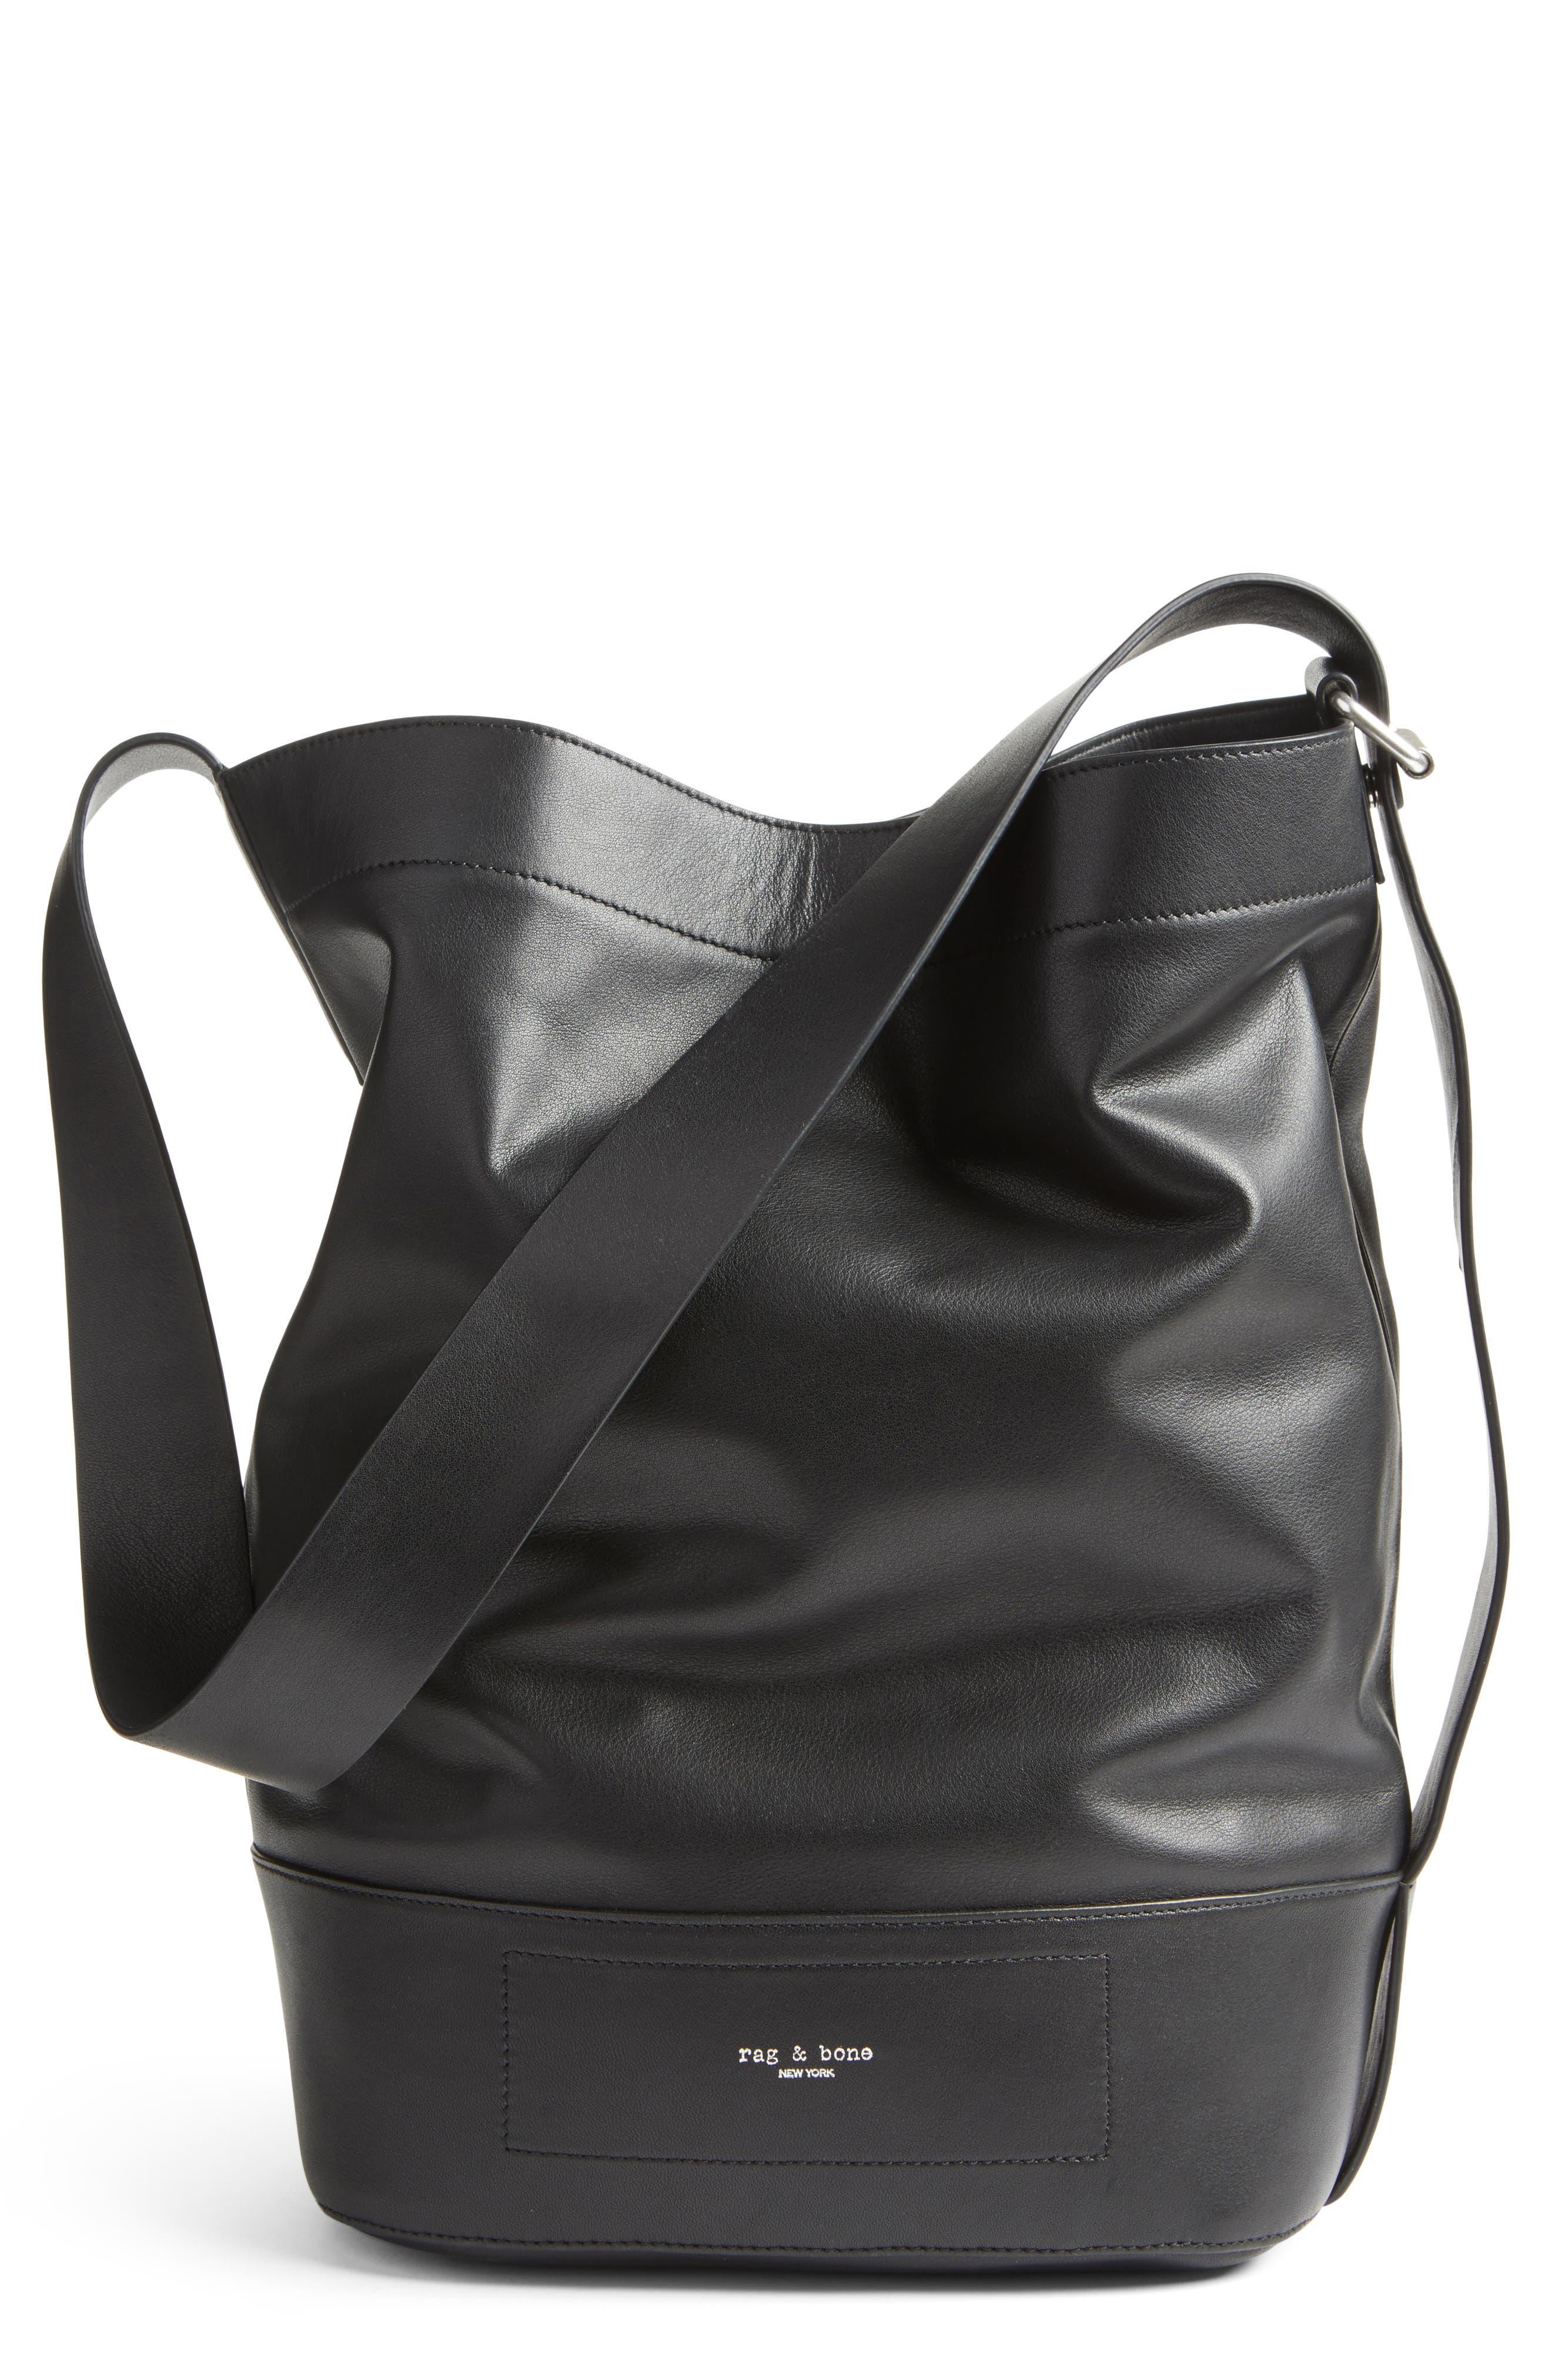 Alternate Image 1 Selected - rag & bone Walker Sling Leather Bucket Bag